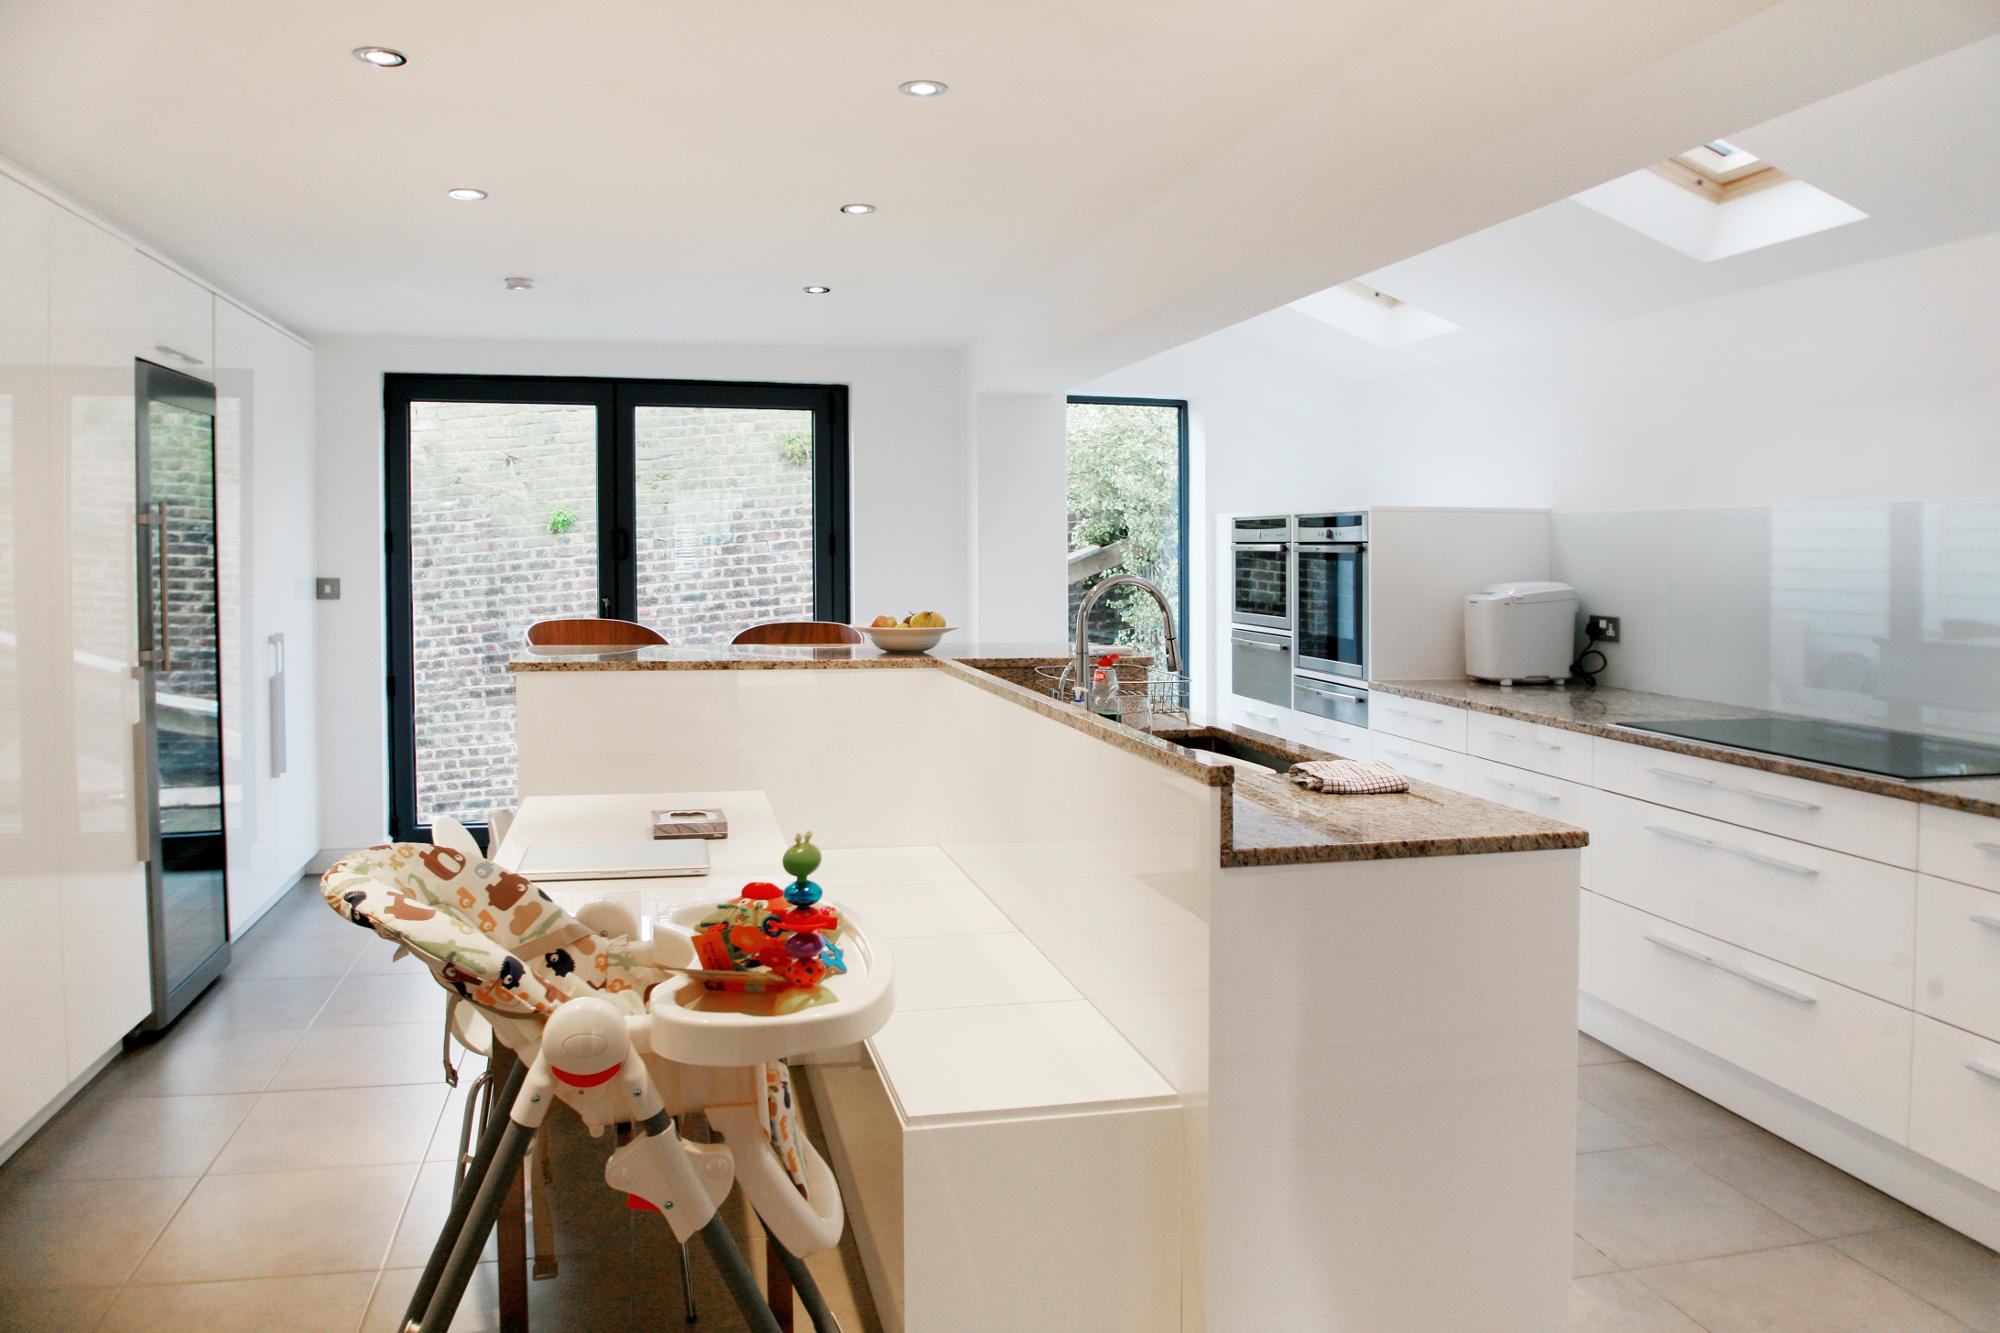 extension design ideas kitchen garden room - house extension ideas